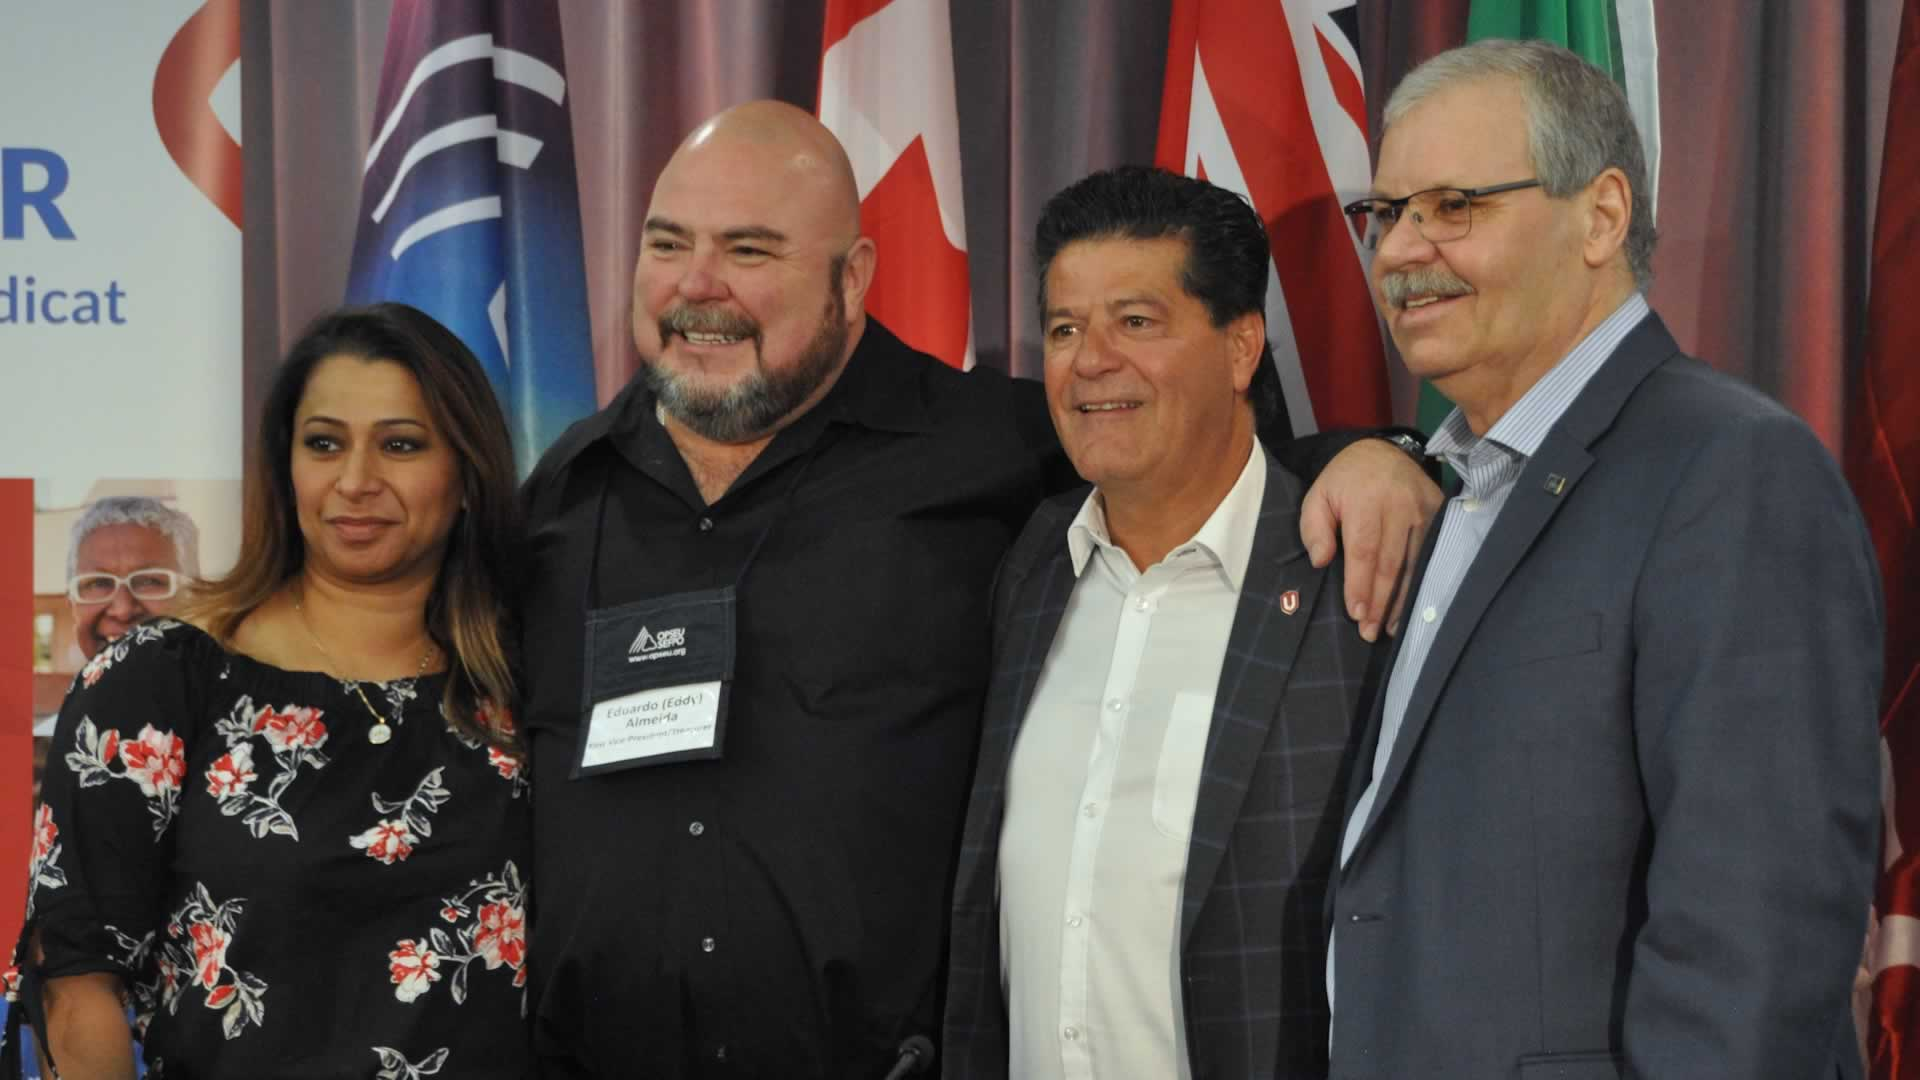 From left to right: Naureen Rizvi, Unifor Ontario Regional Director, Eduardo (Eddy) Almeida, OPSEU First Vice-President/Treasurer, Jerry Dias, Unifor National President, Warren (Smokey) Thomas, OPSEU President.